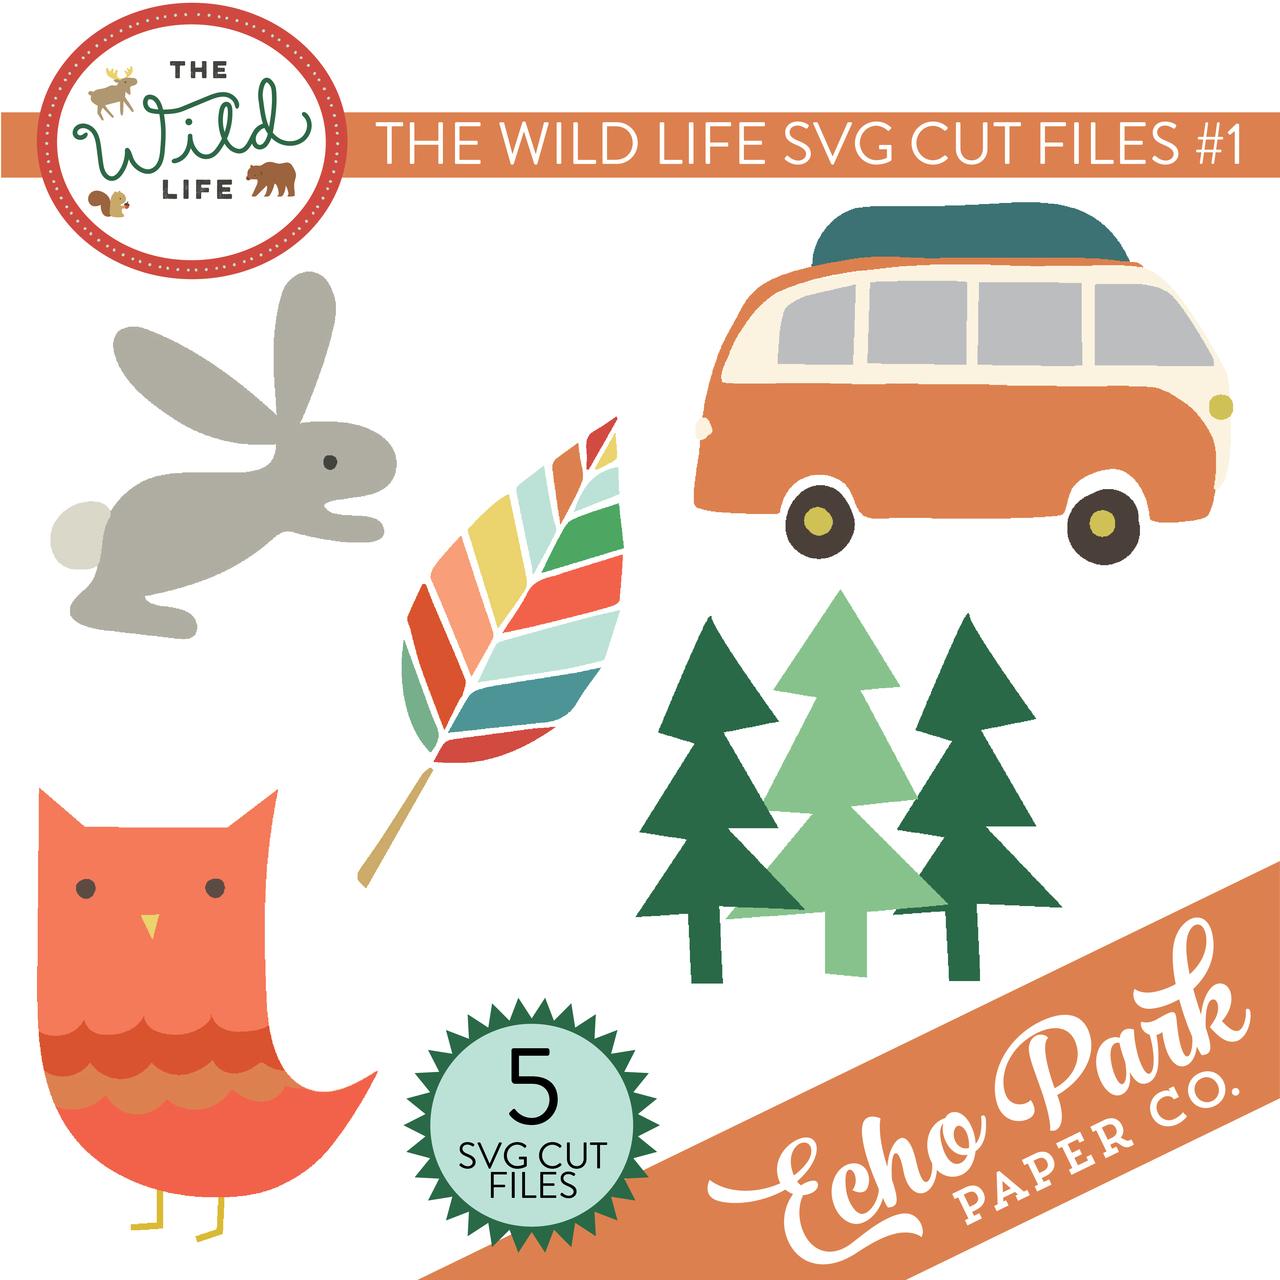 The Wild Life SVG Cut Files #1